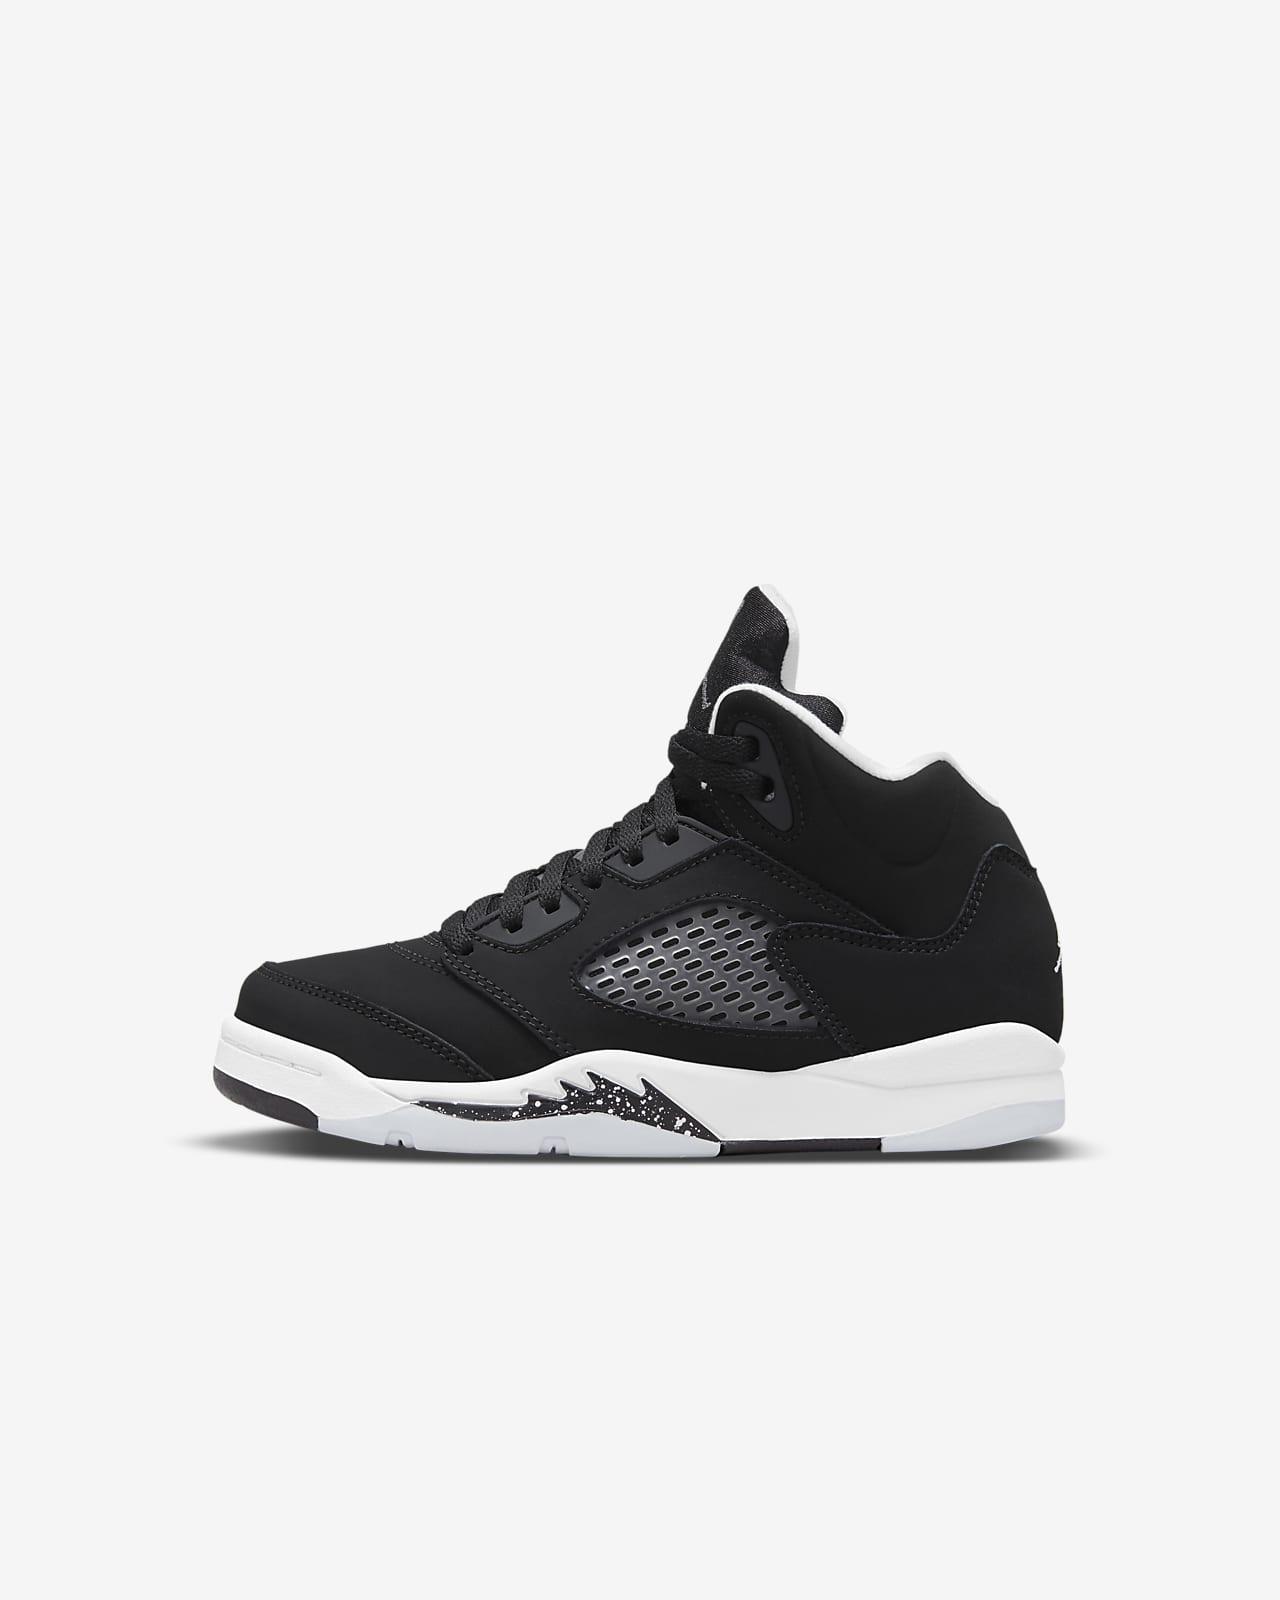 Jordan 5 Retro 小童鞋款